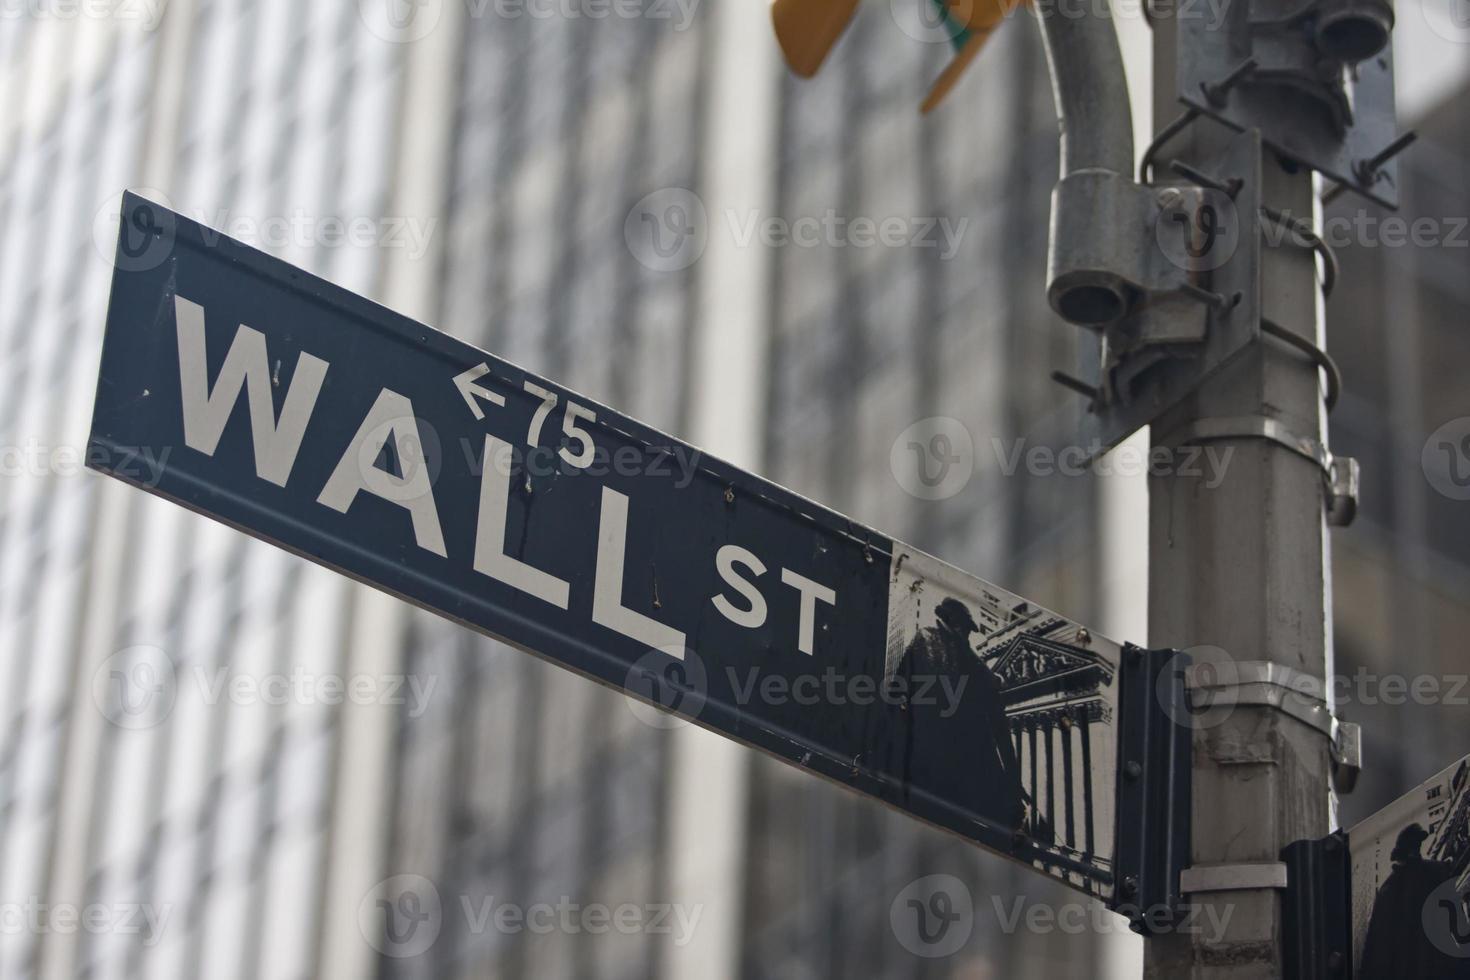 stati uniti d'america - new york - new york, cartello stradale foto